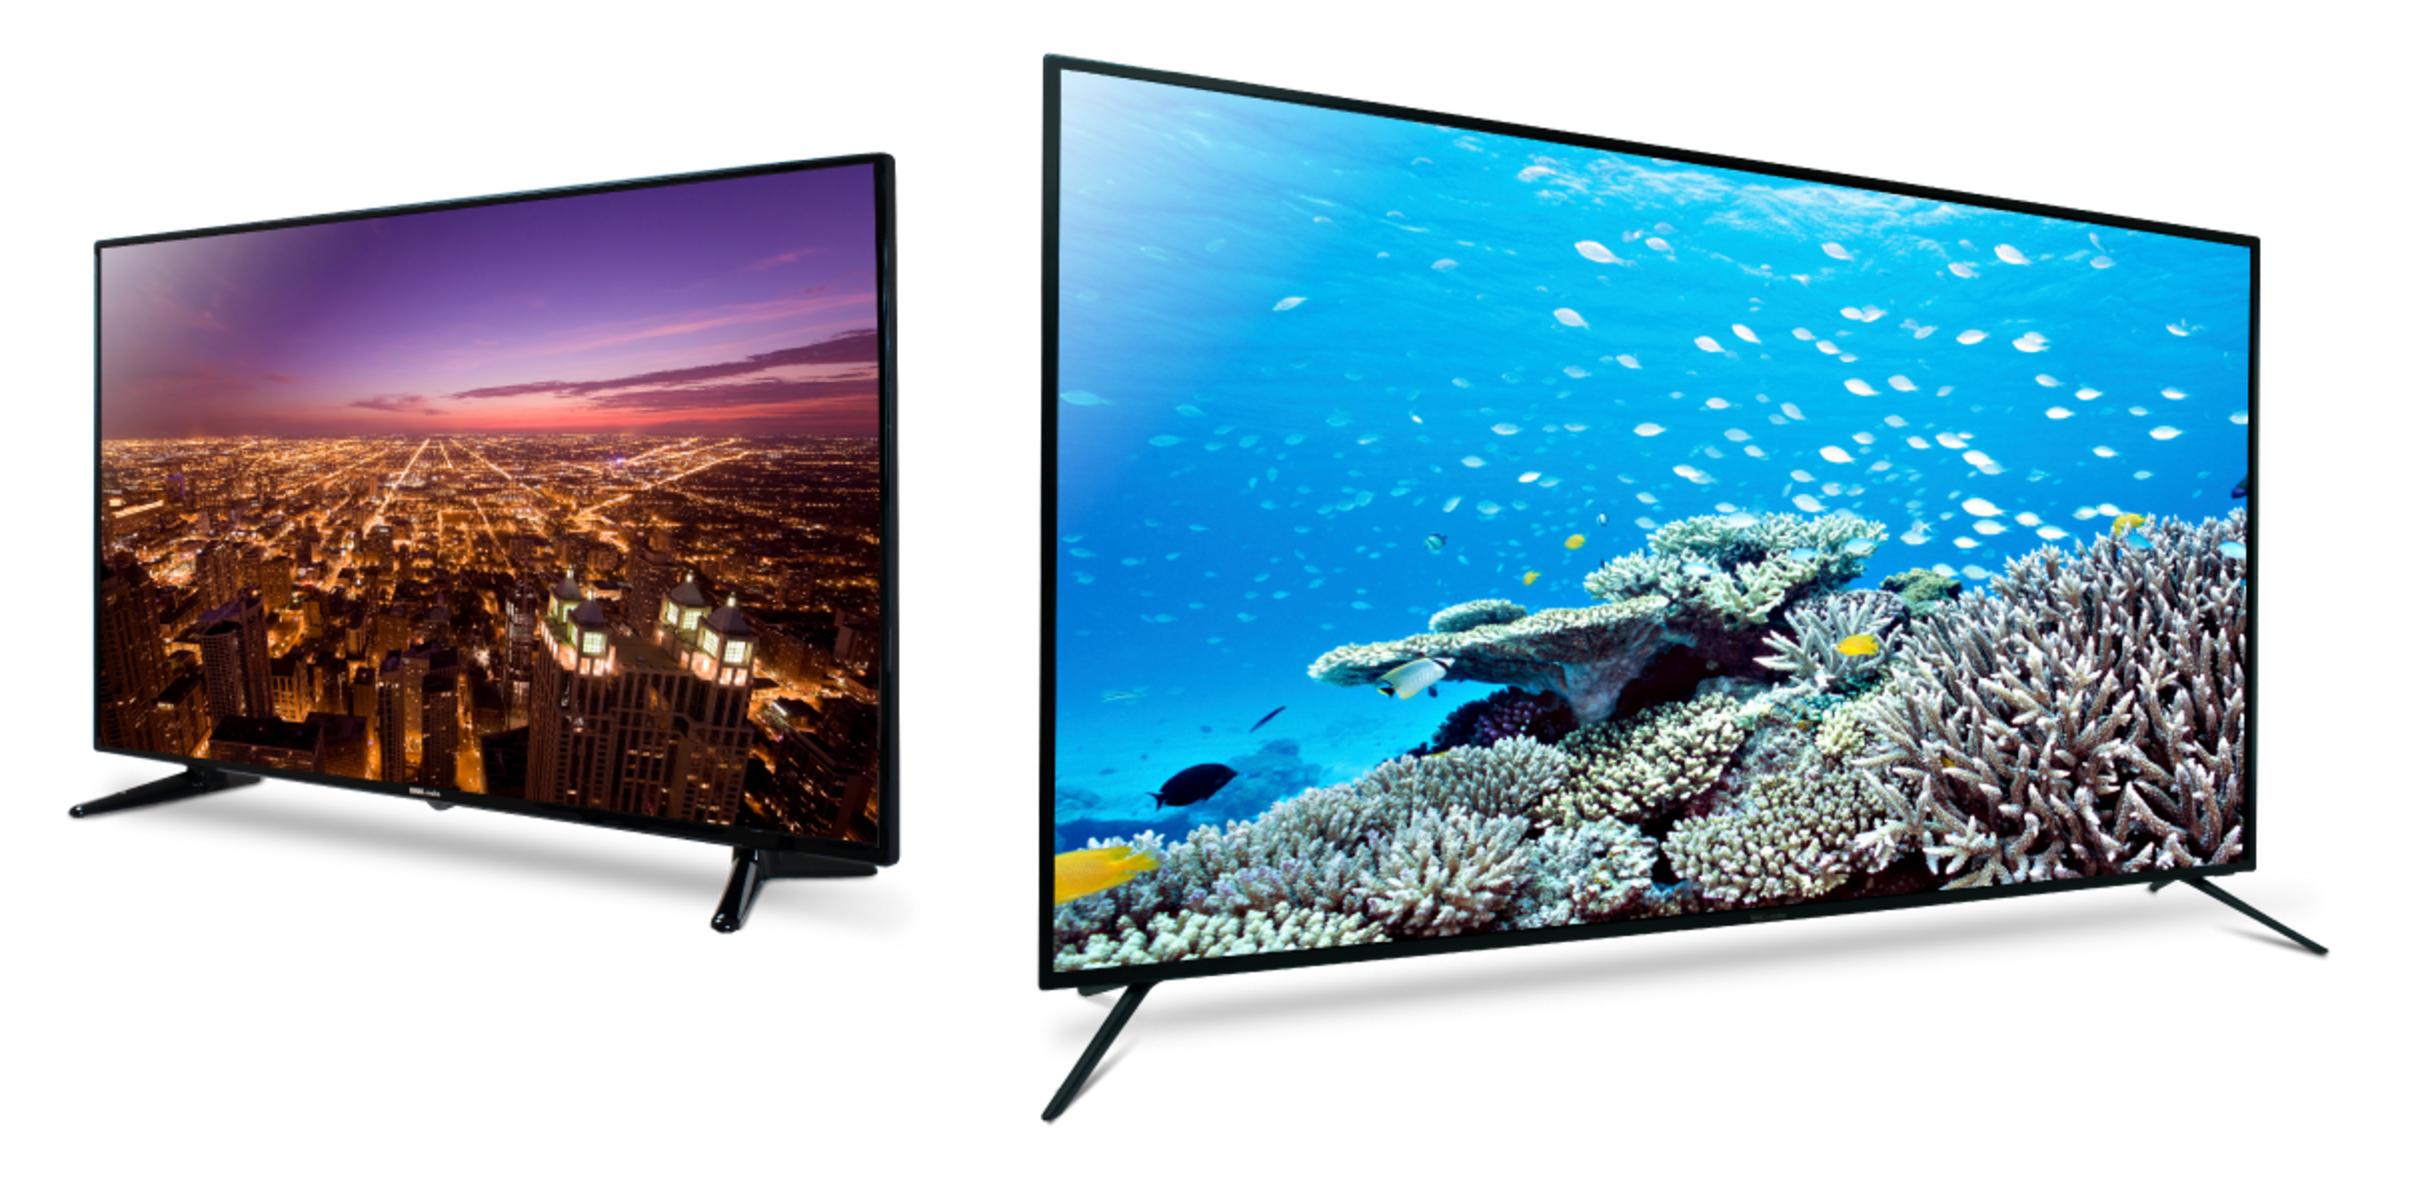 DMMが4K対応のテレビを低価格で発売!50インチ5万9,900円、65インチ159,900円!